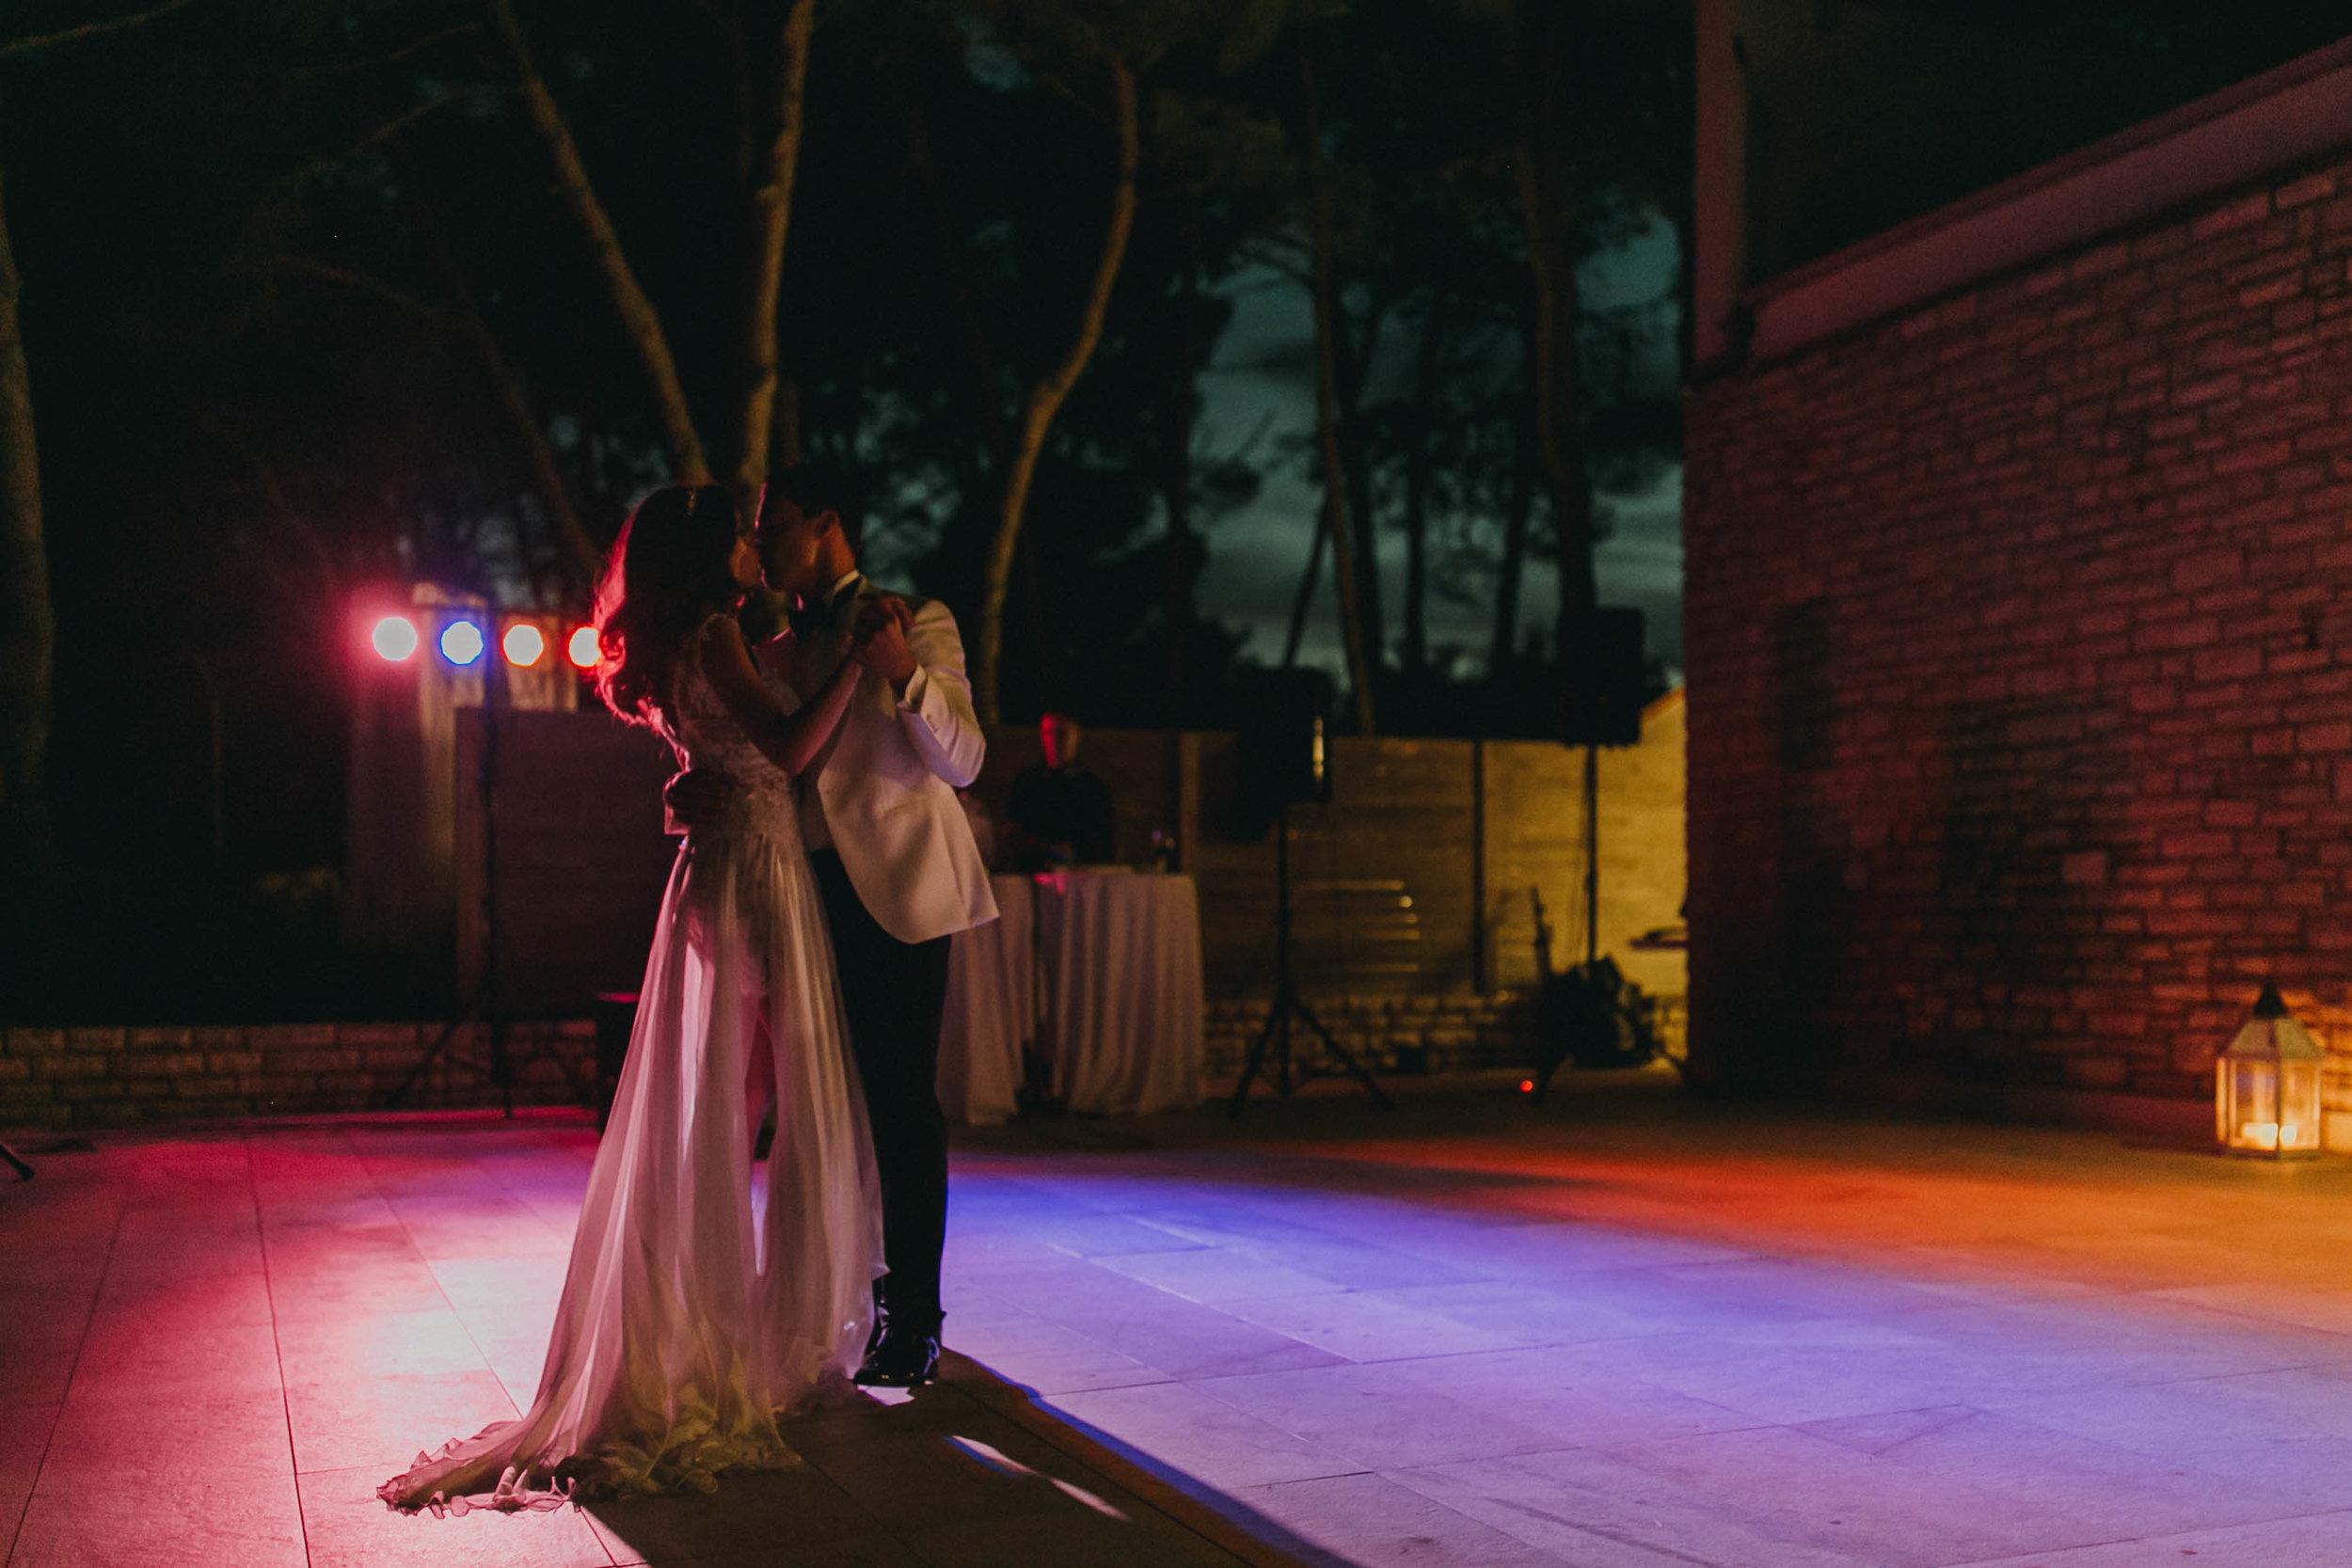 sylvia&dimitri-Wedding-Crvena_Luka-Croatia-97(9323).jpg